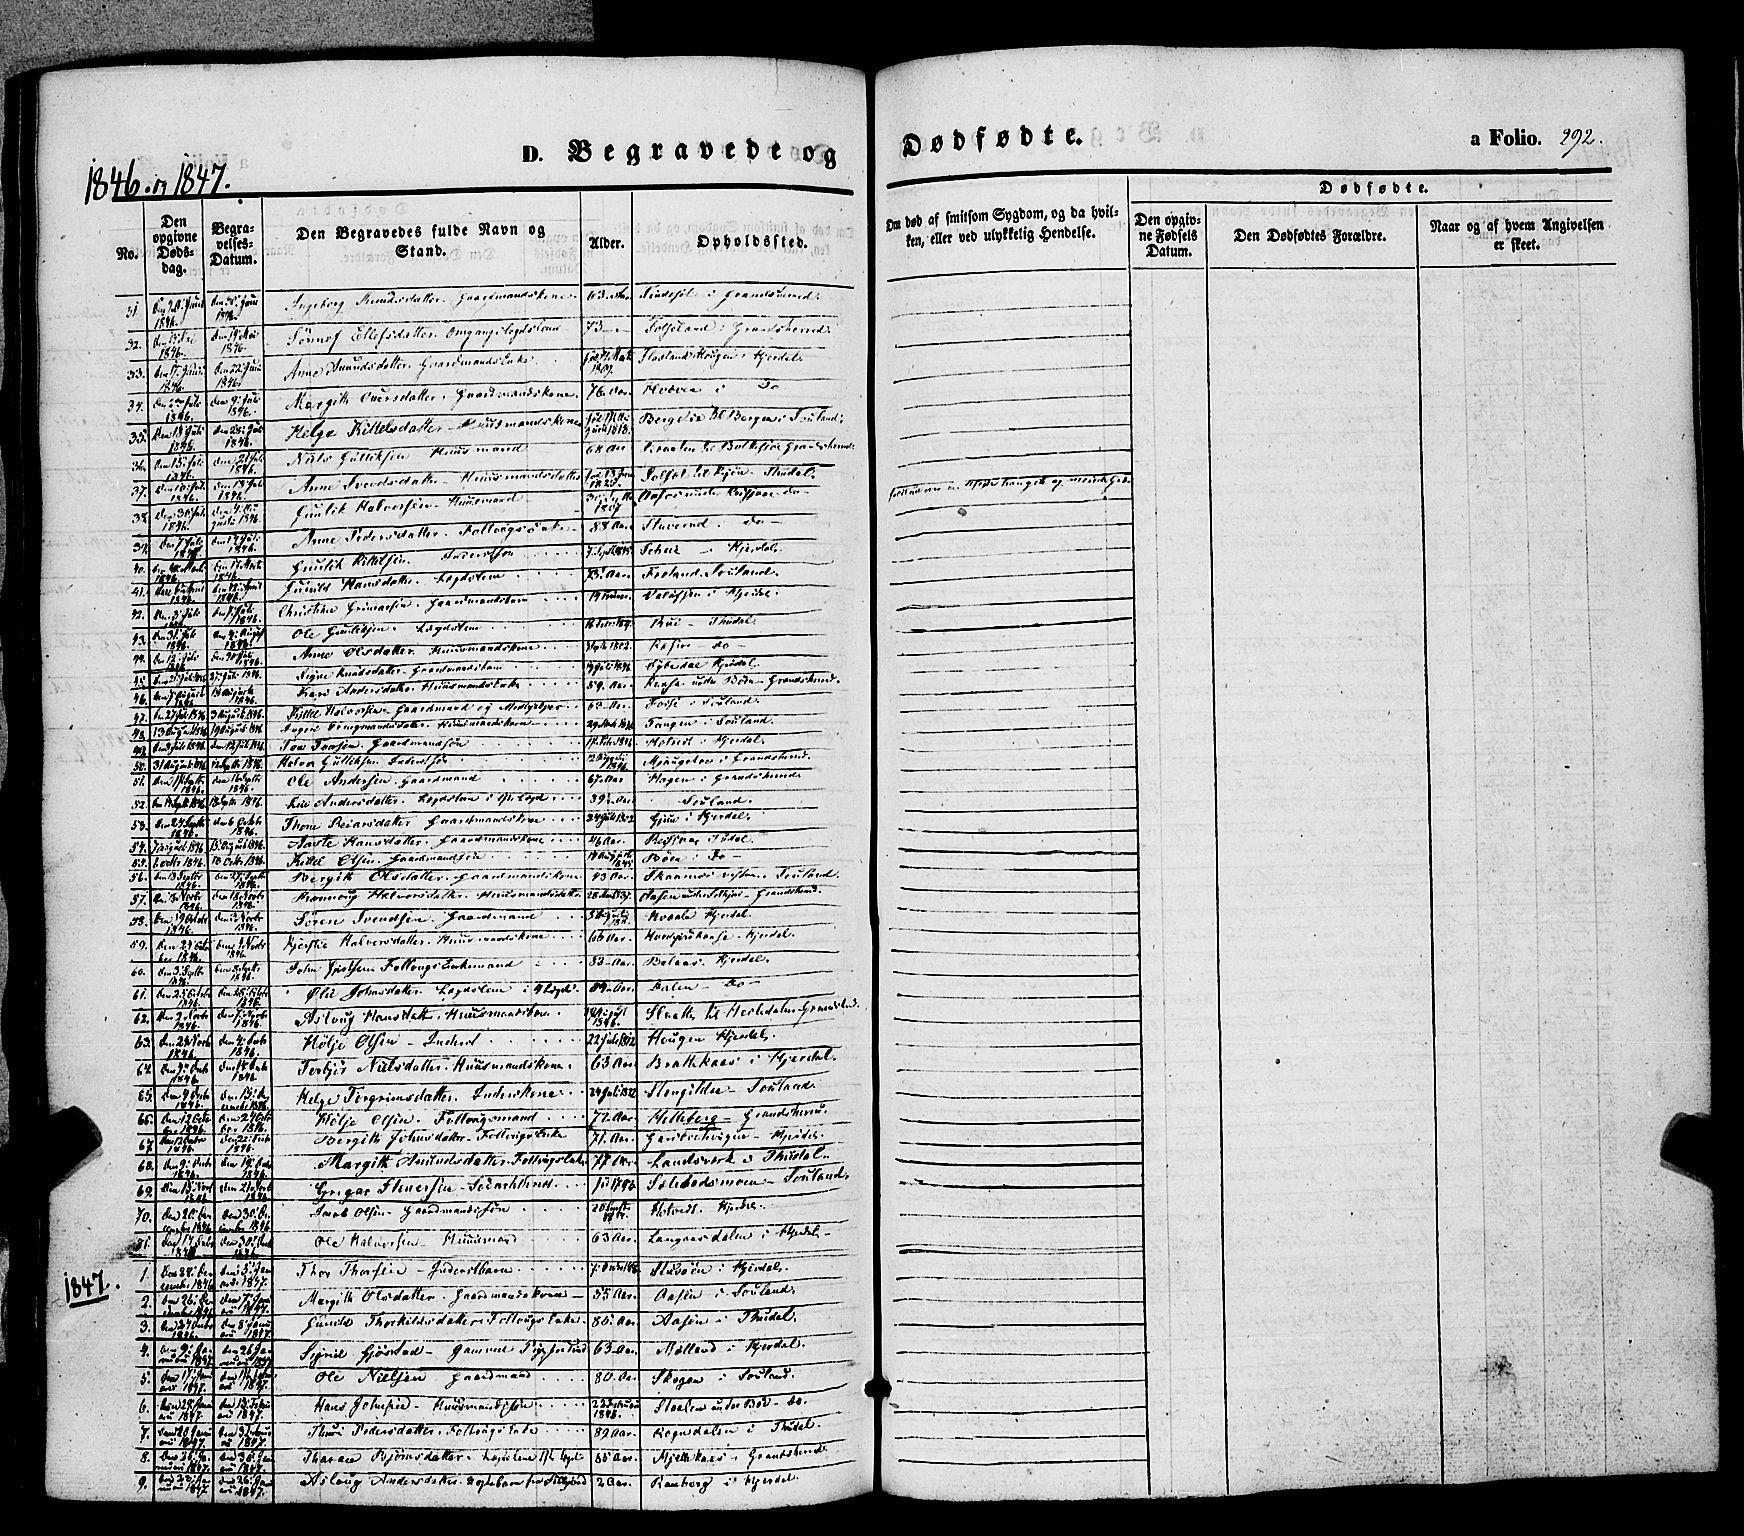 SAKO, Hjartdal kirkebøker, F/Fa/L0008: Ministerialbok nr. I 8, 1844-1859, s. 292